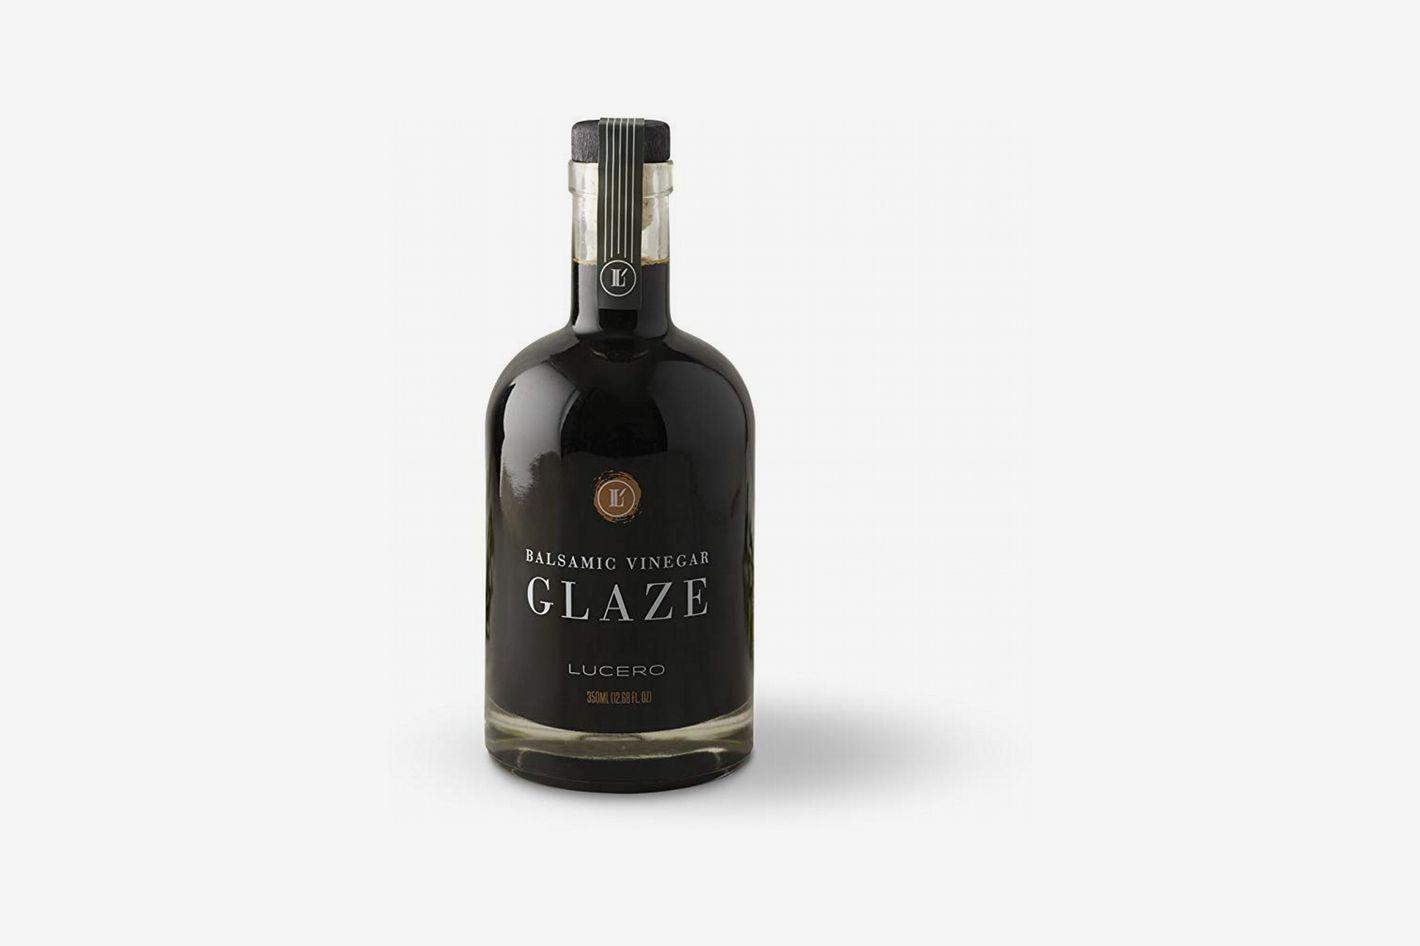 Lucero Balsamic Vinegar Glaze